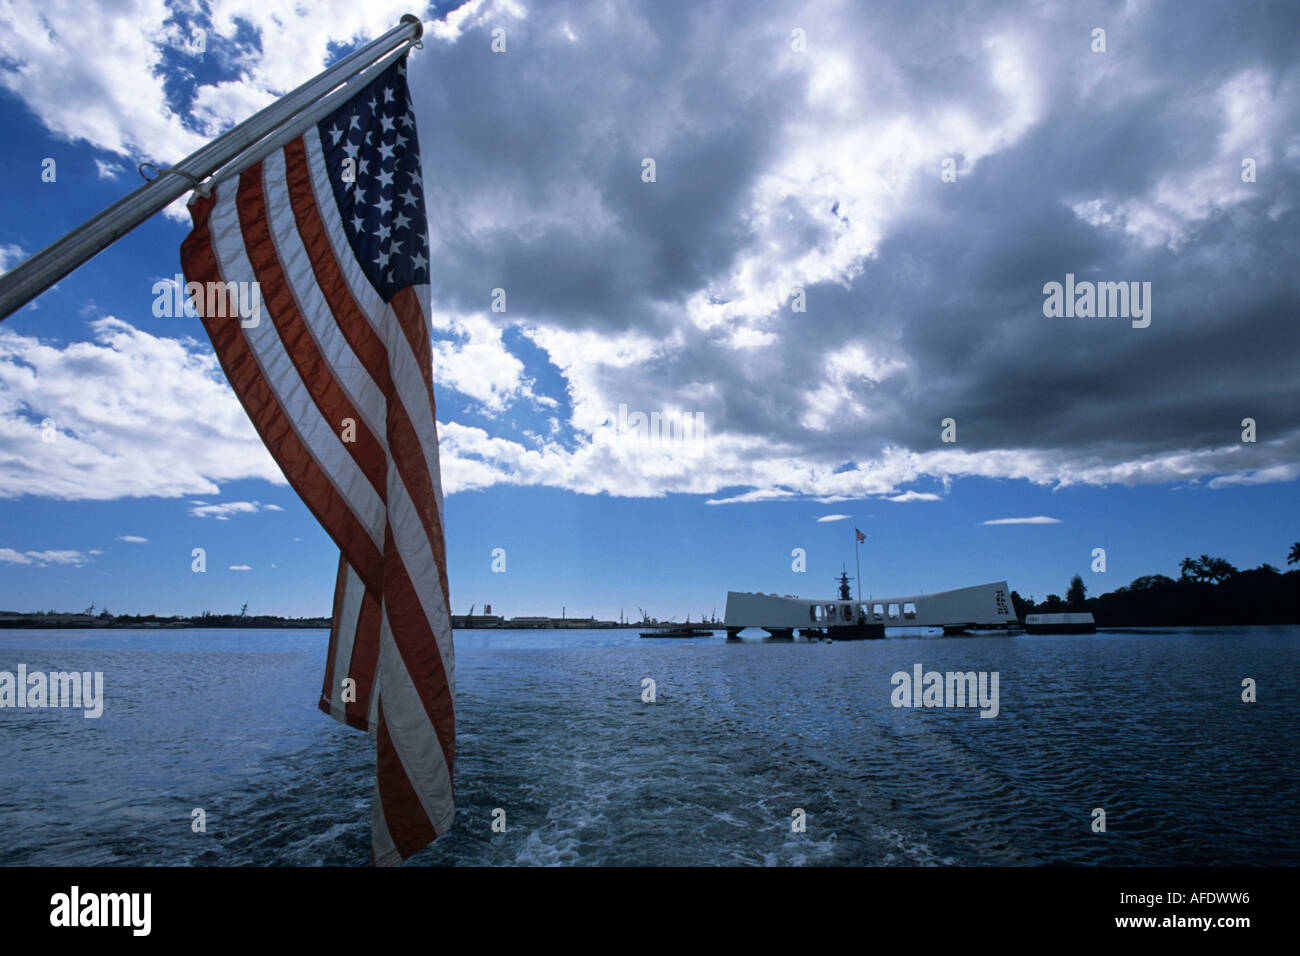 USS Arizona Memorial, Pearl Harbor, Honolulu, Oahu, Hawaii, USA Stock Photo